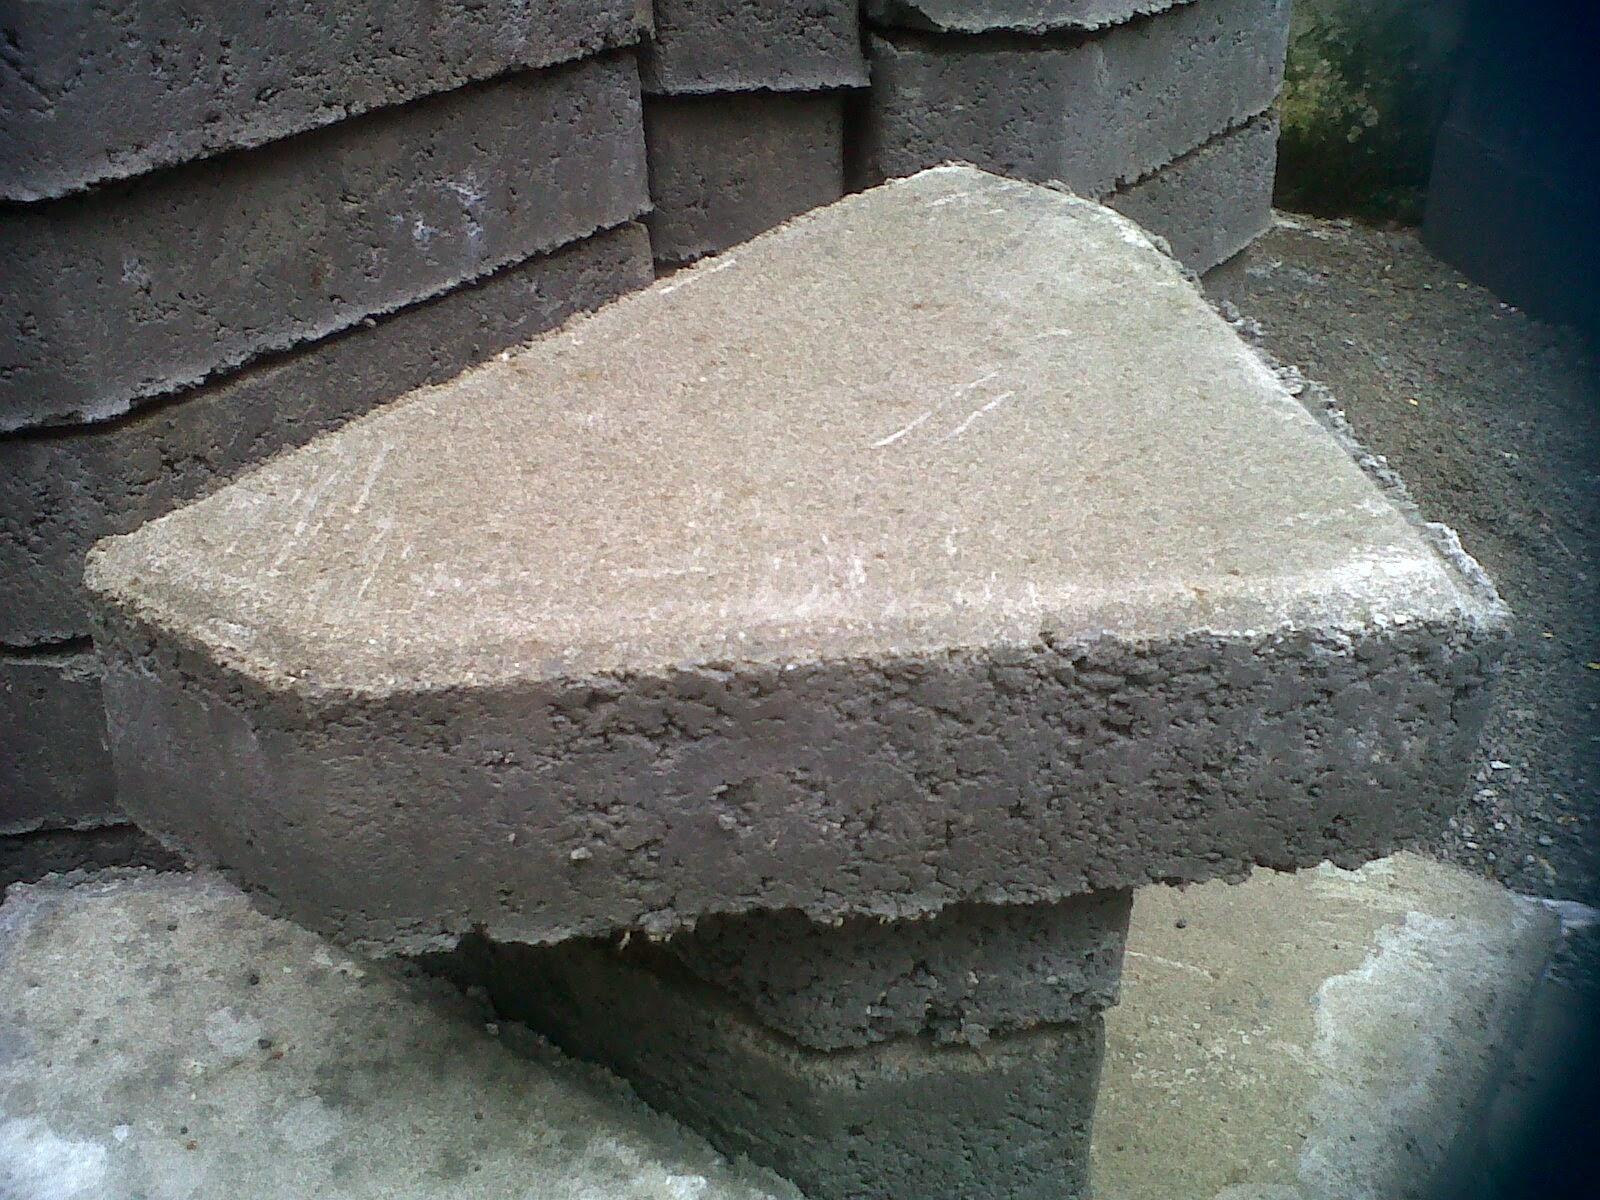 Jual Paving block\/Grass block\/kanstin\/ buis beton: Jual Grass Block \/ Paving Taman \/ Paving